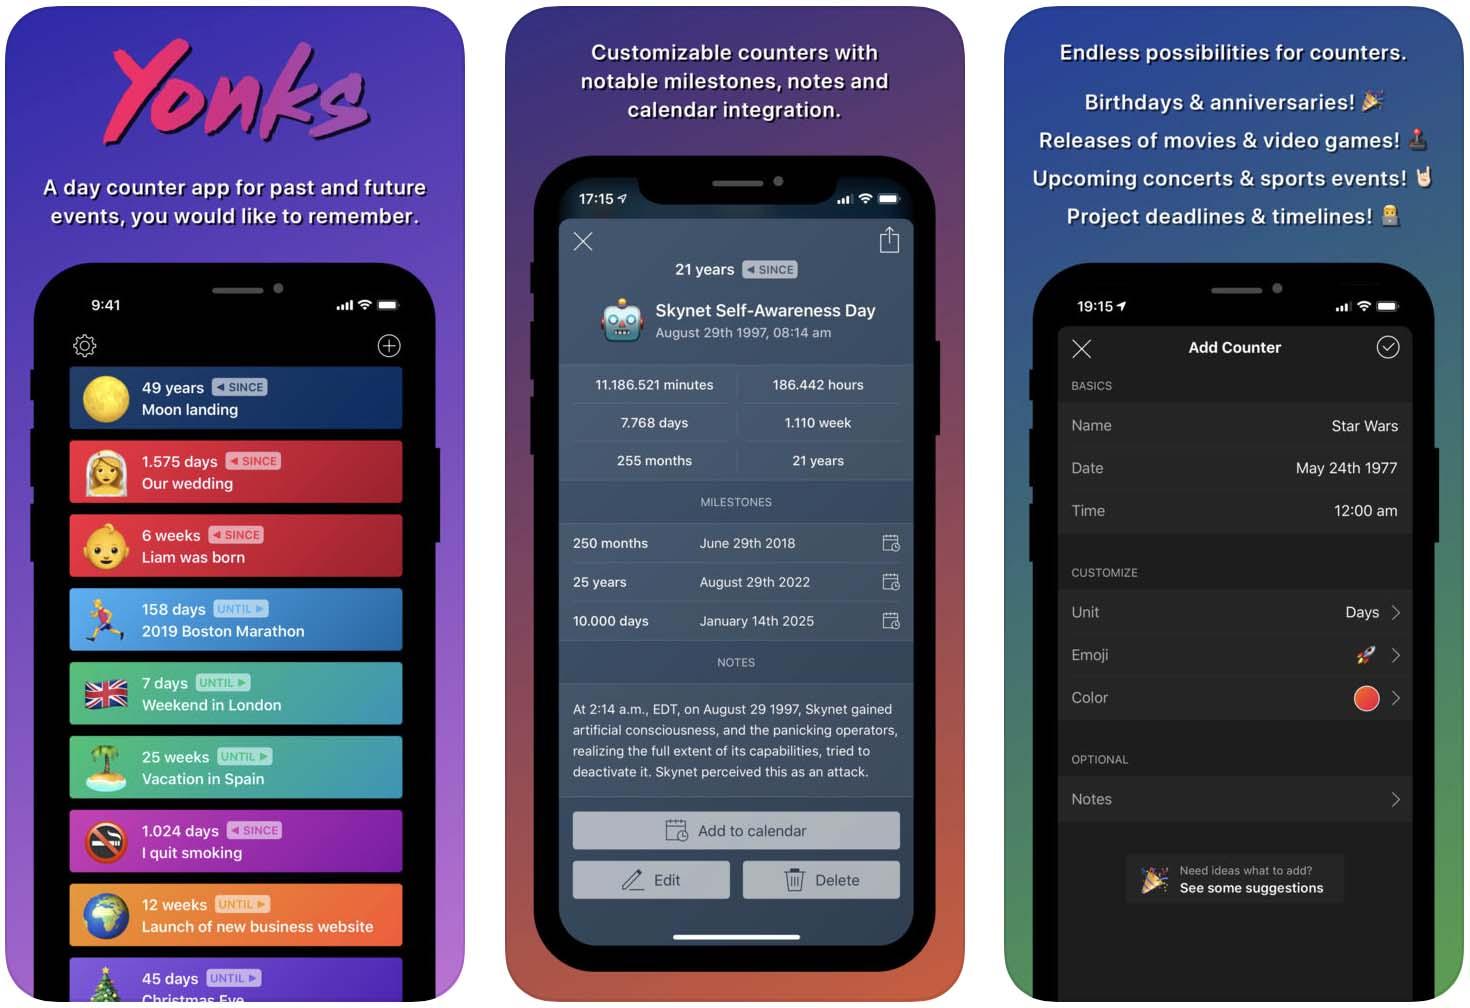 Telas do aplicativo Yonks